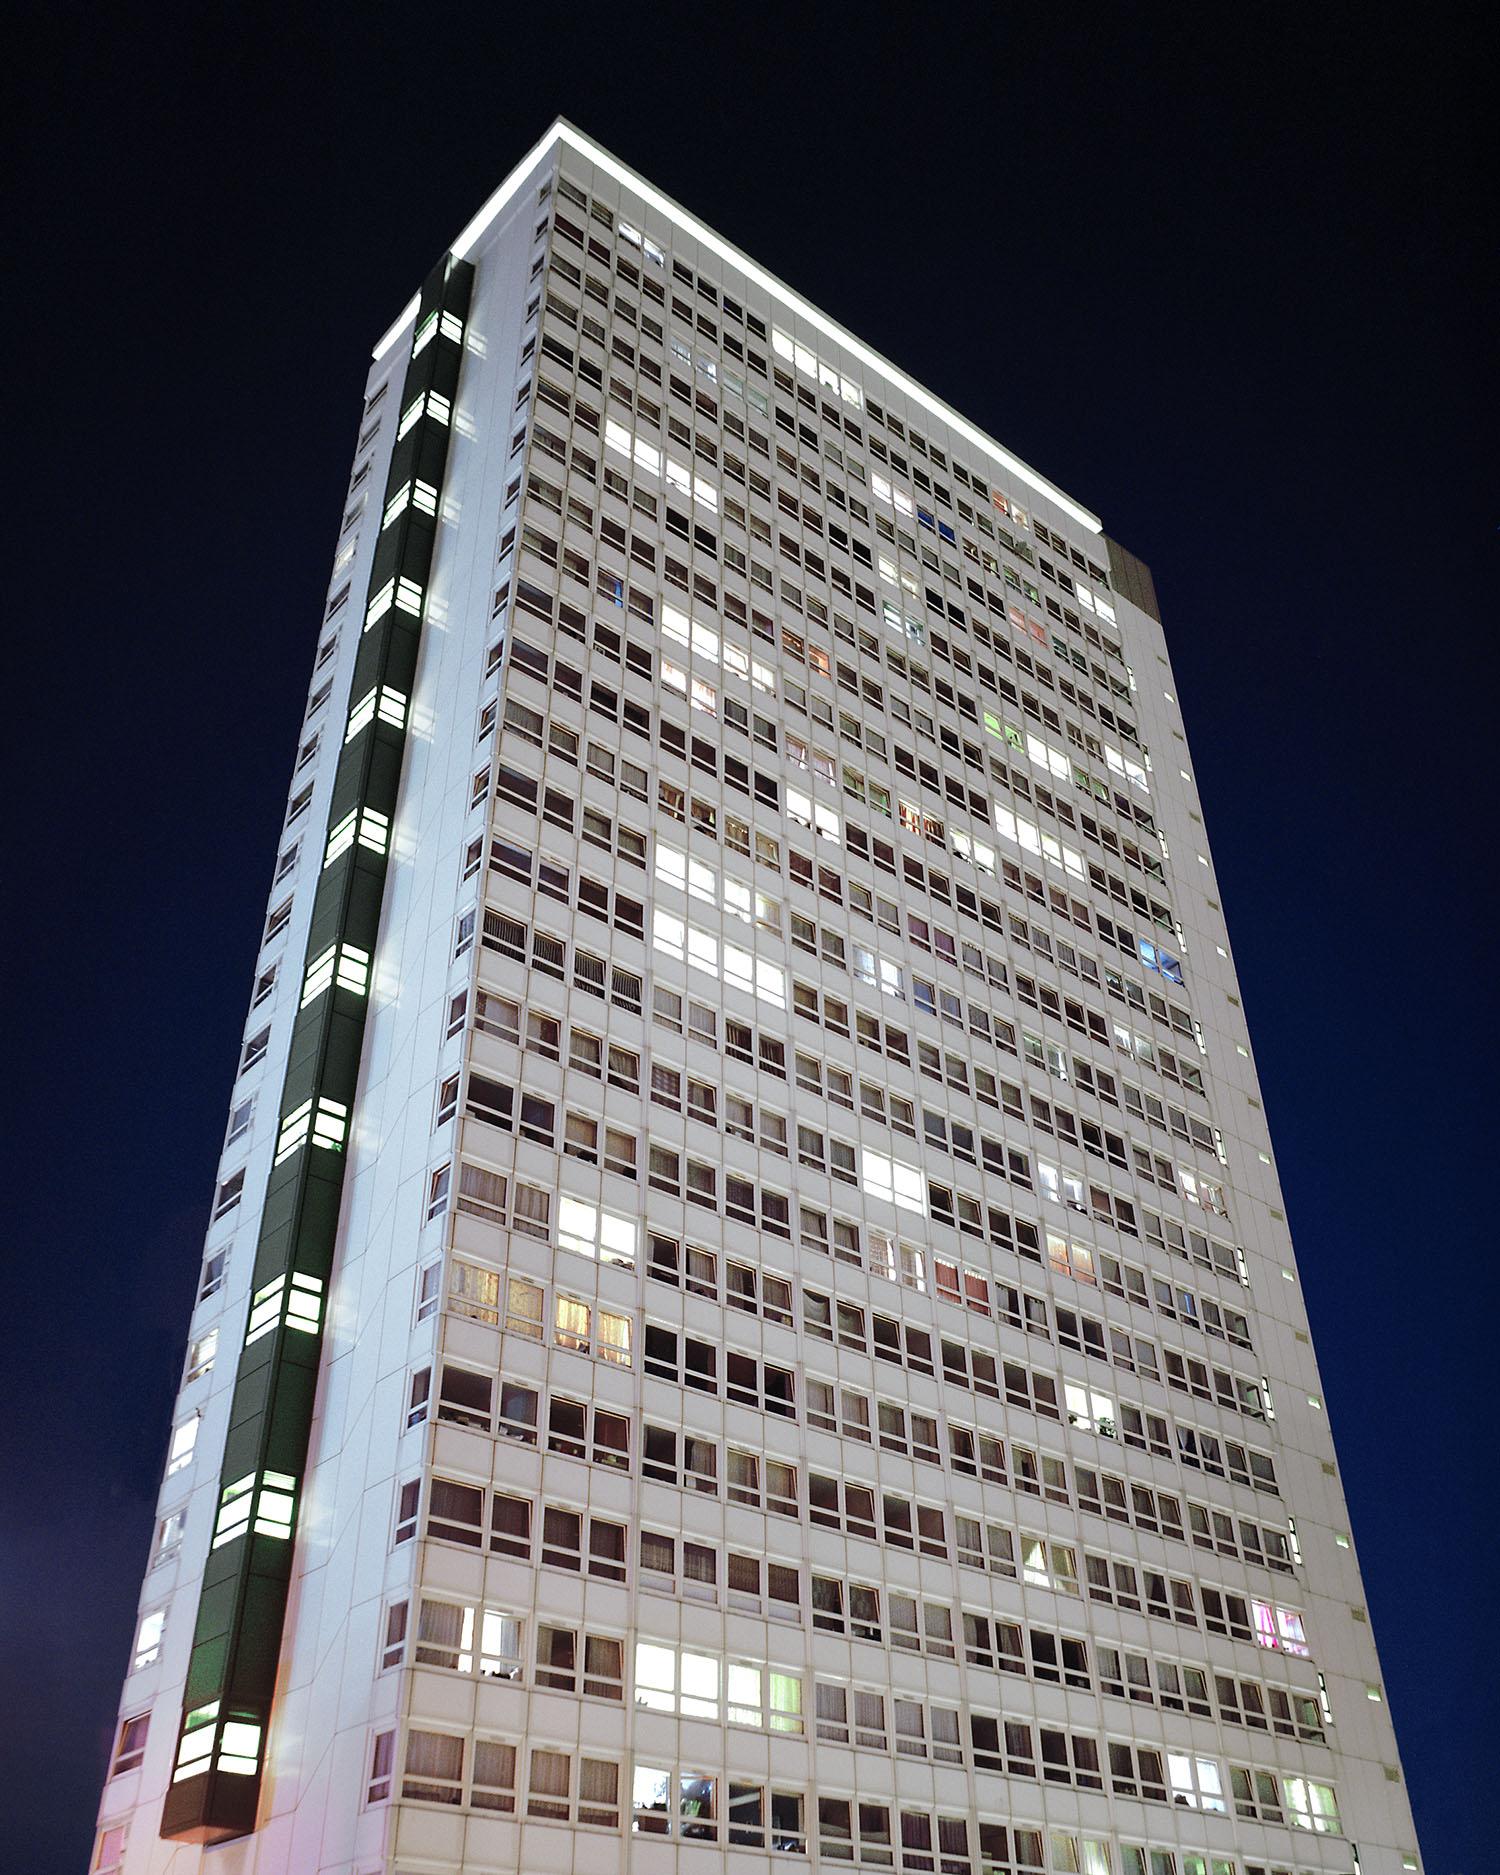 White tower 001 copy.jpg